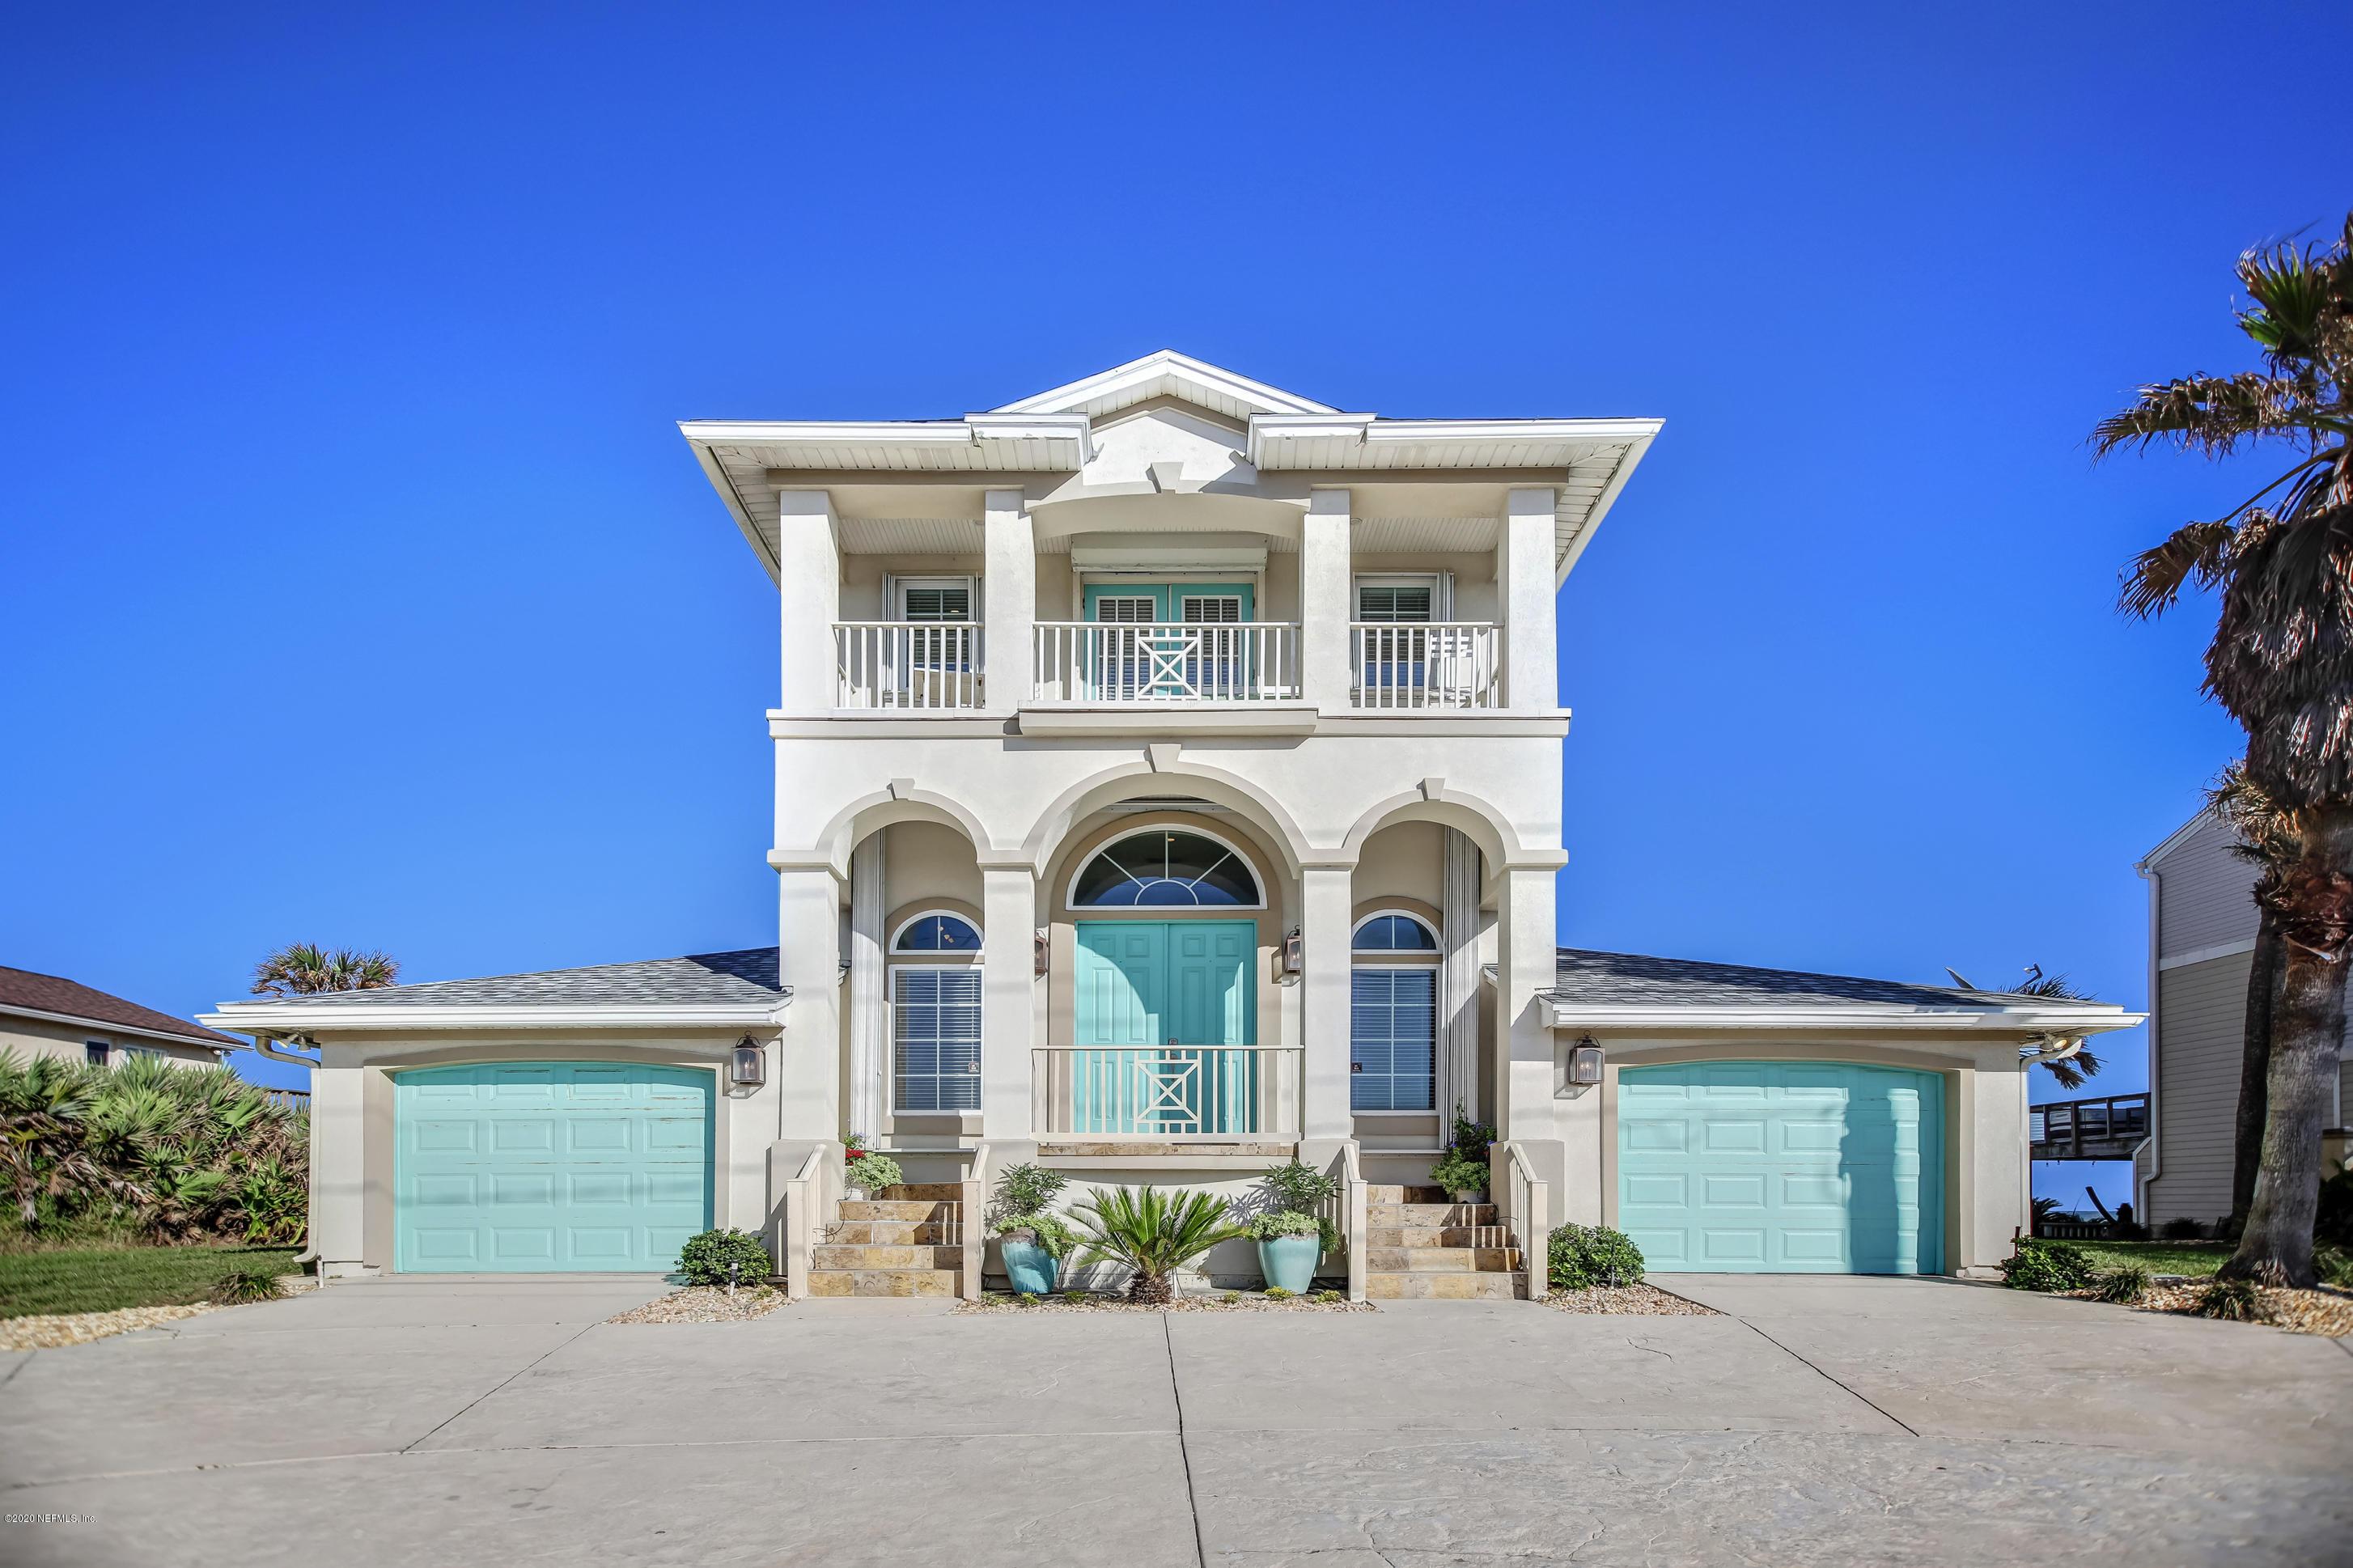 2941 PONTE VEDRA, PONTE VEDRA BEACH, FLORIDA 32082, 4 Bedrooms Bedrooms, ,3 BathroomsBathrooms,Residential,For sale,PONTE VEDRA,1083343